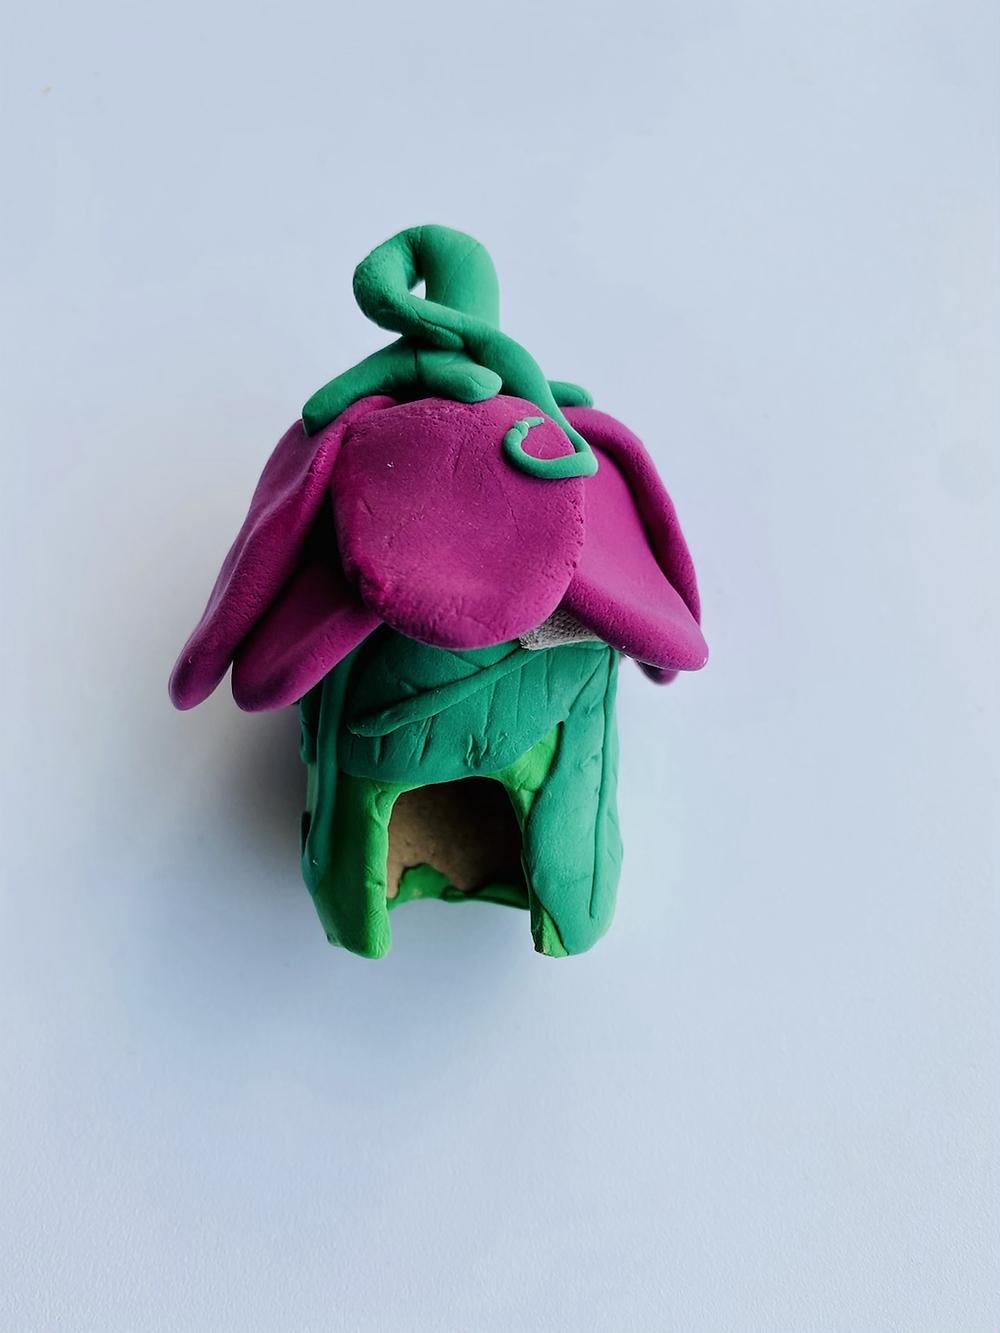 Flower fairy house craft for kids